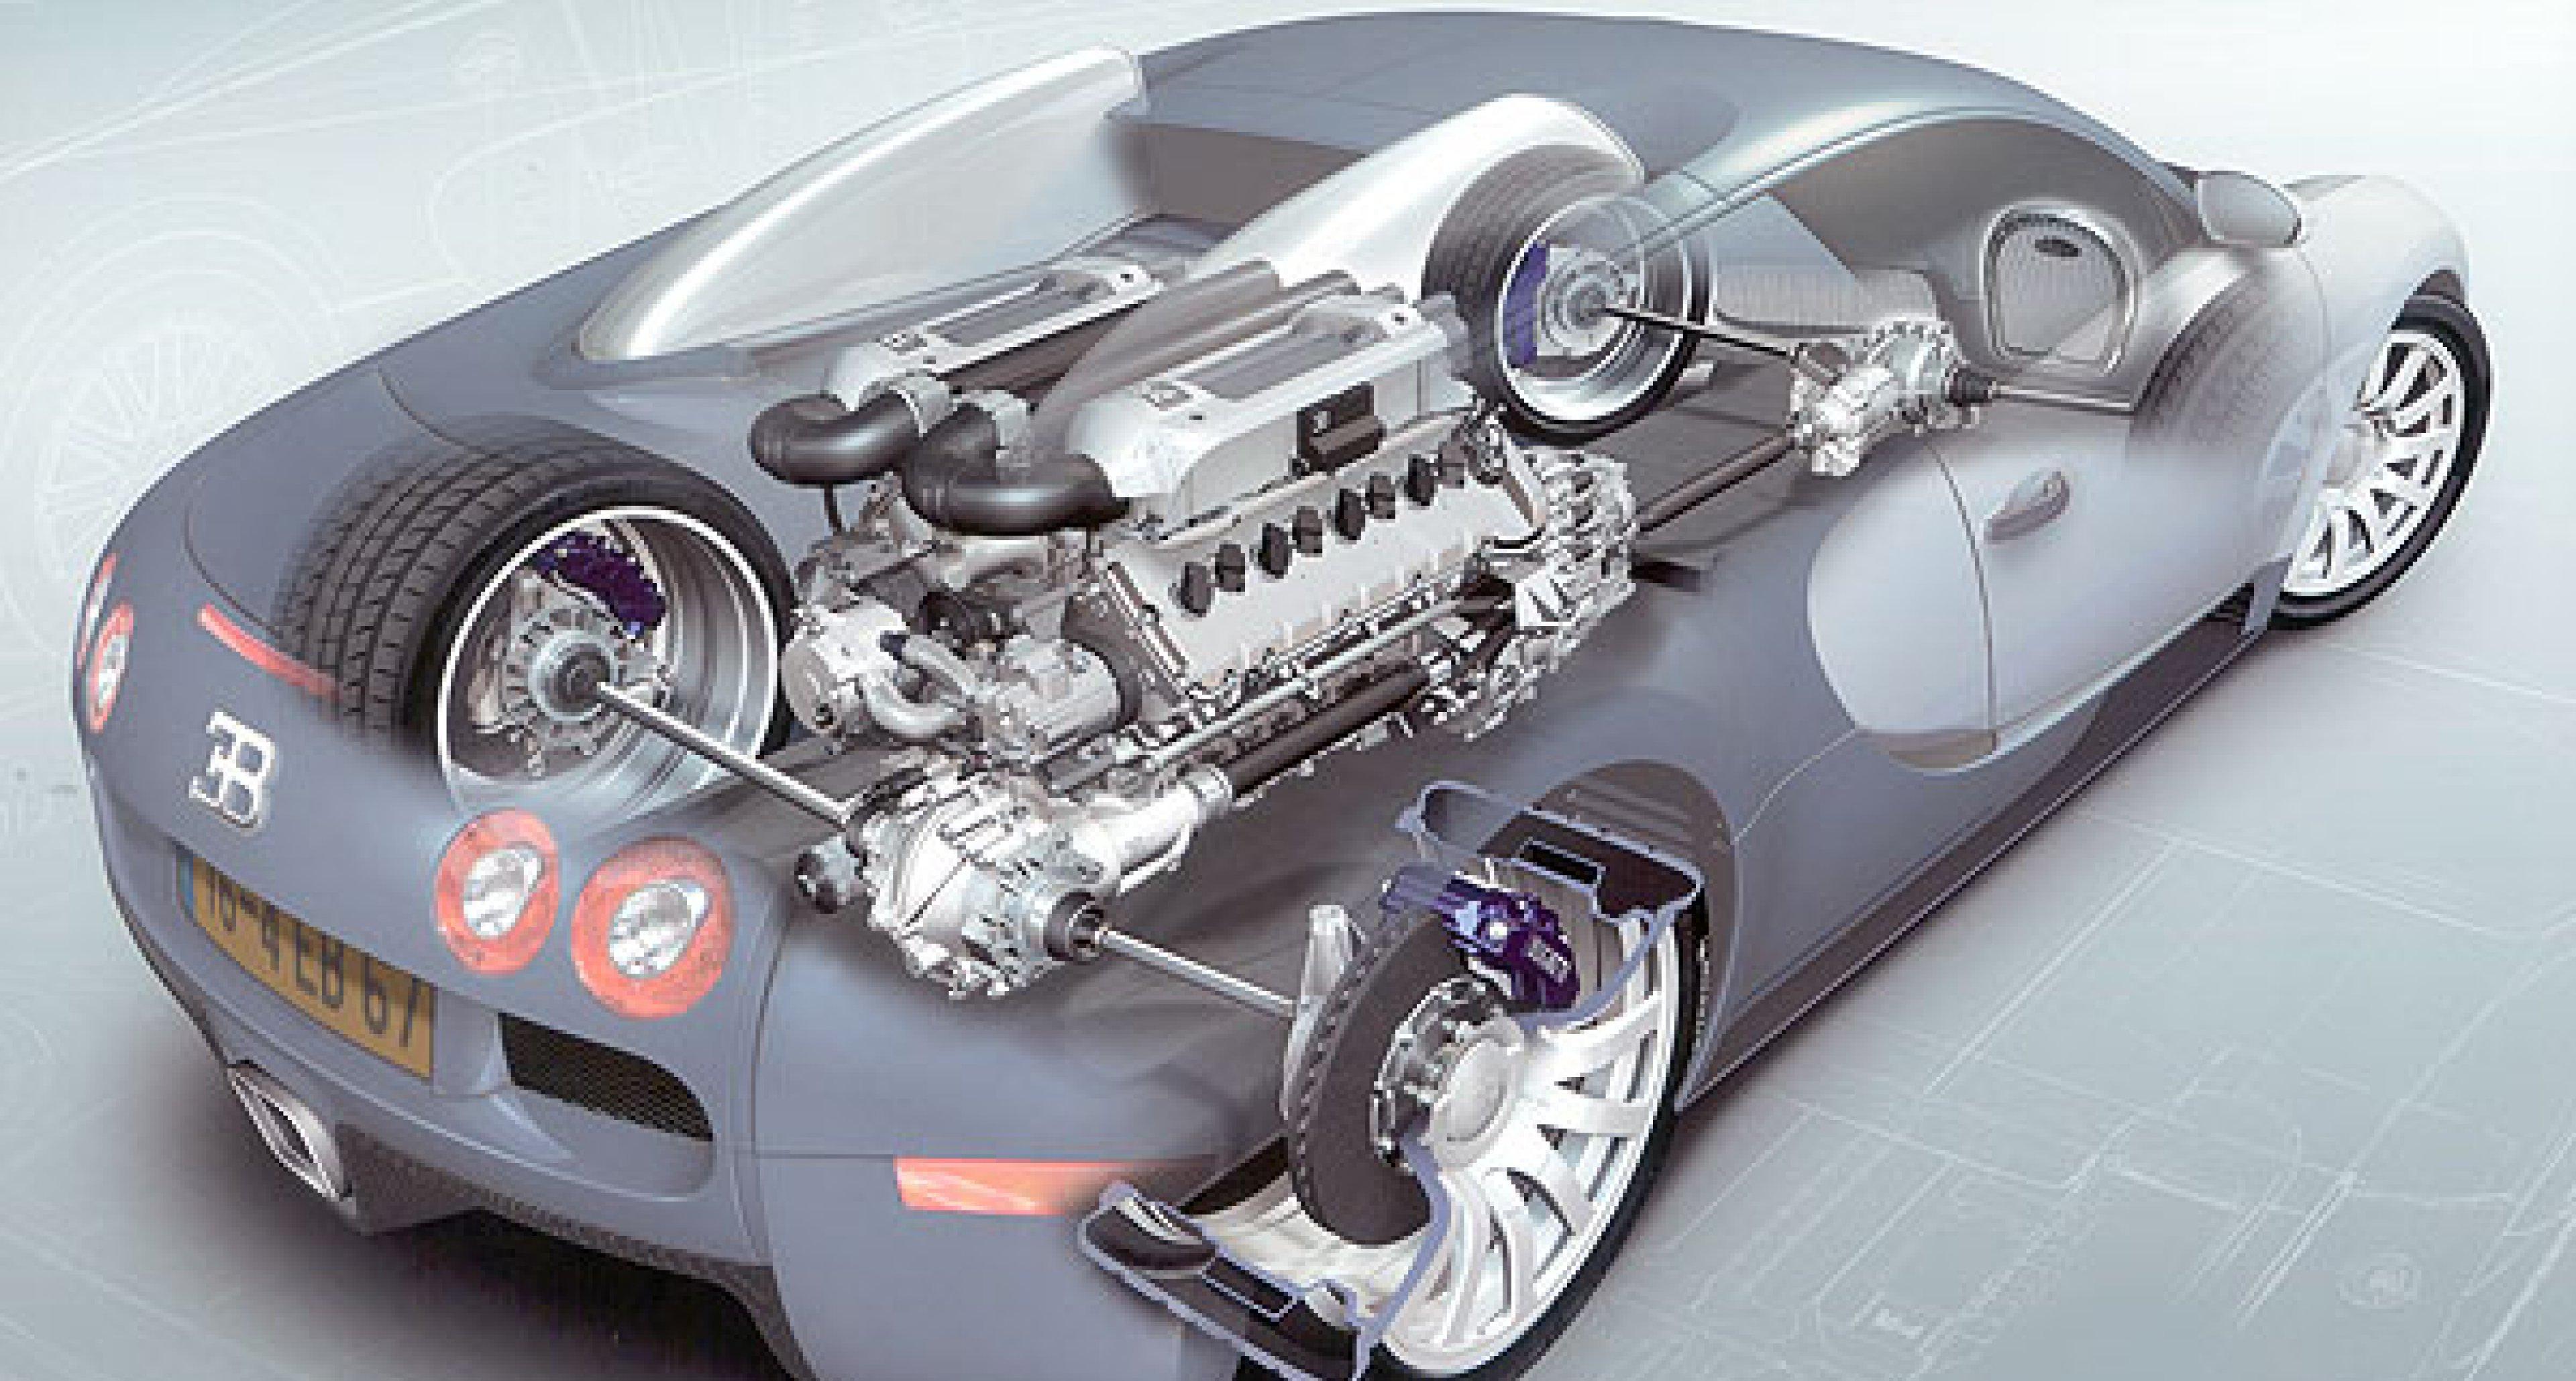 bugatti veyron 16.4: unter der lupe | classic driver magazine